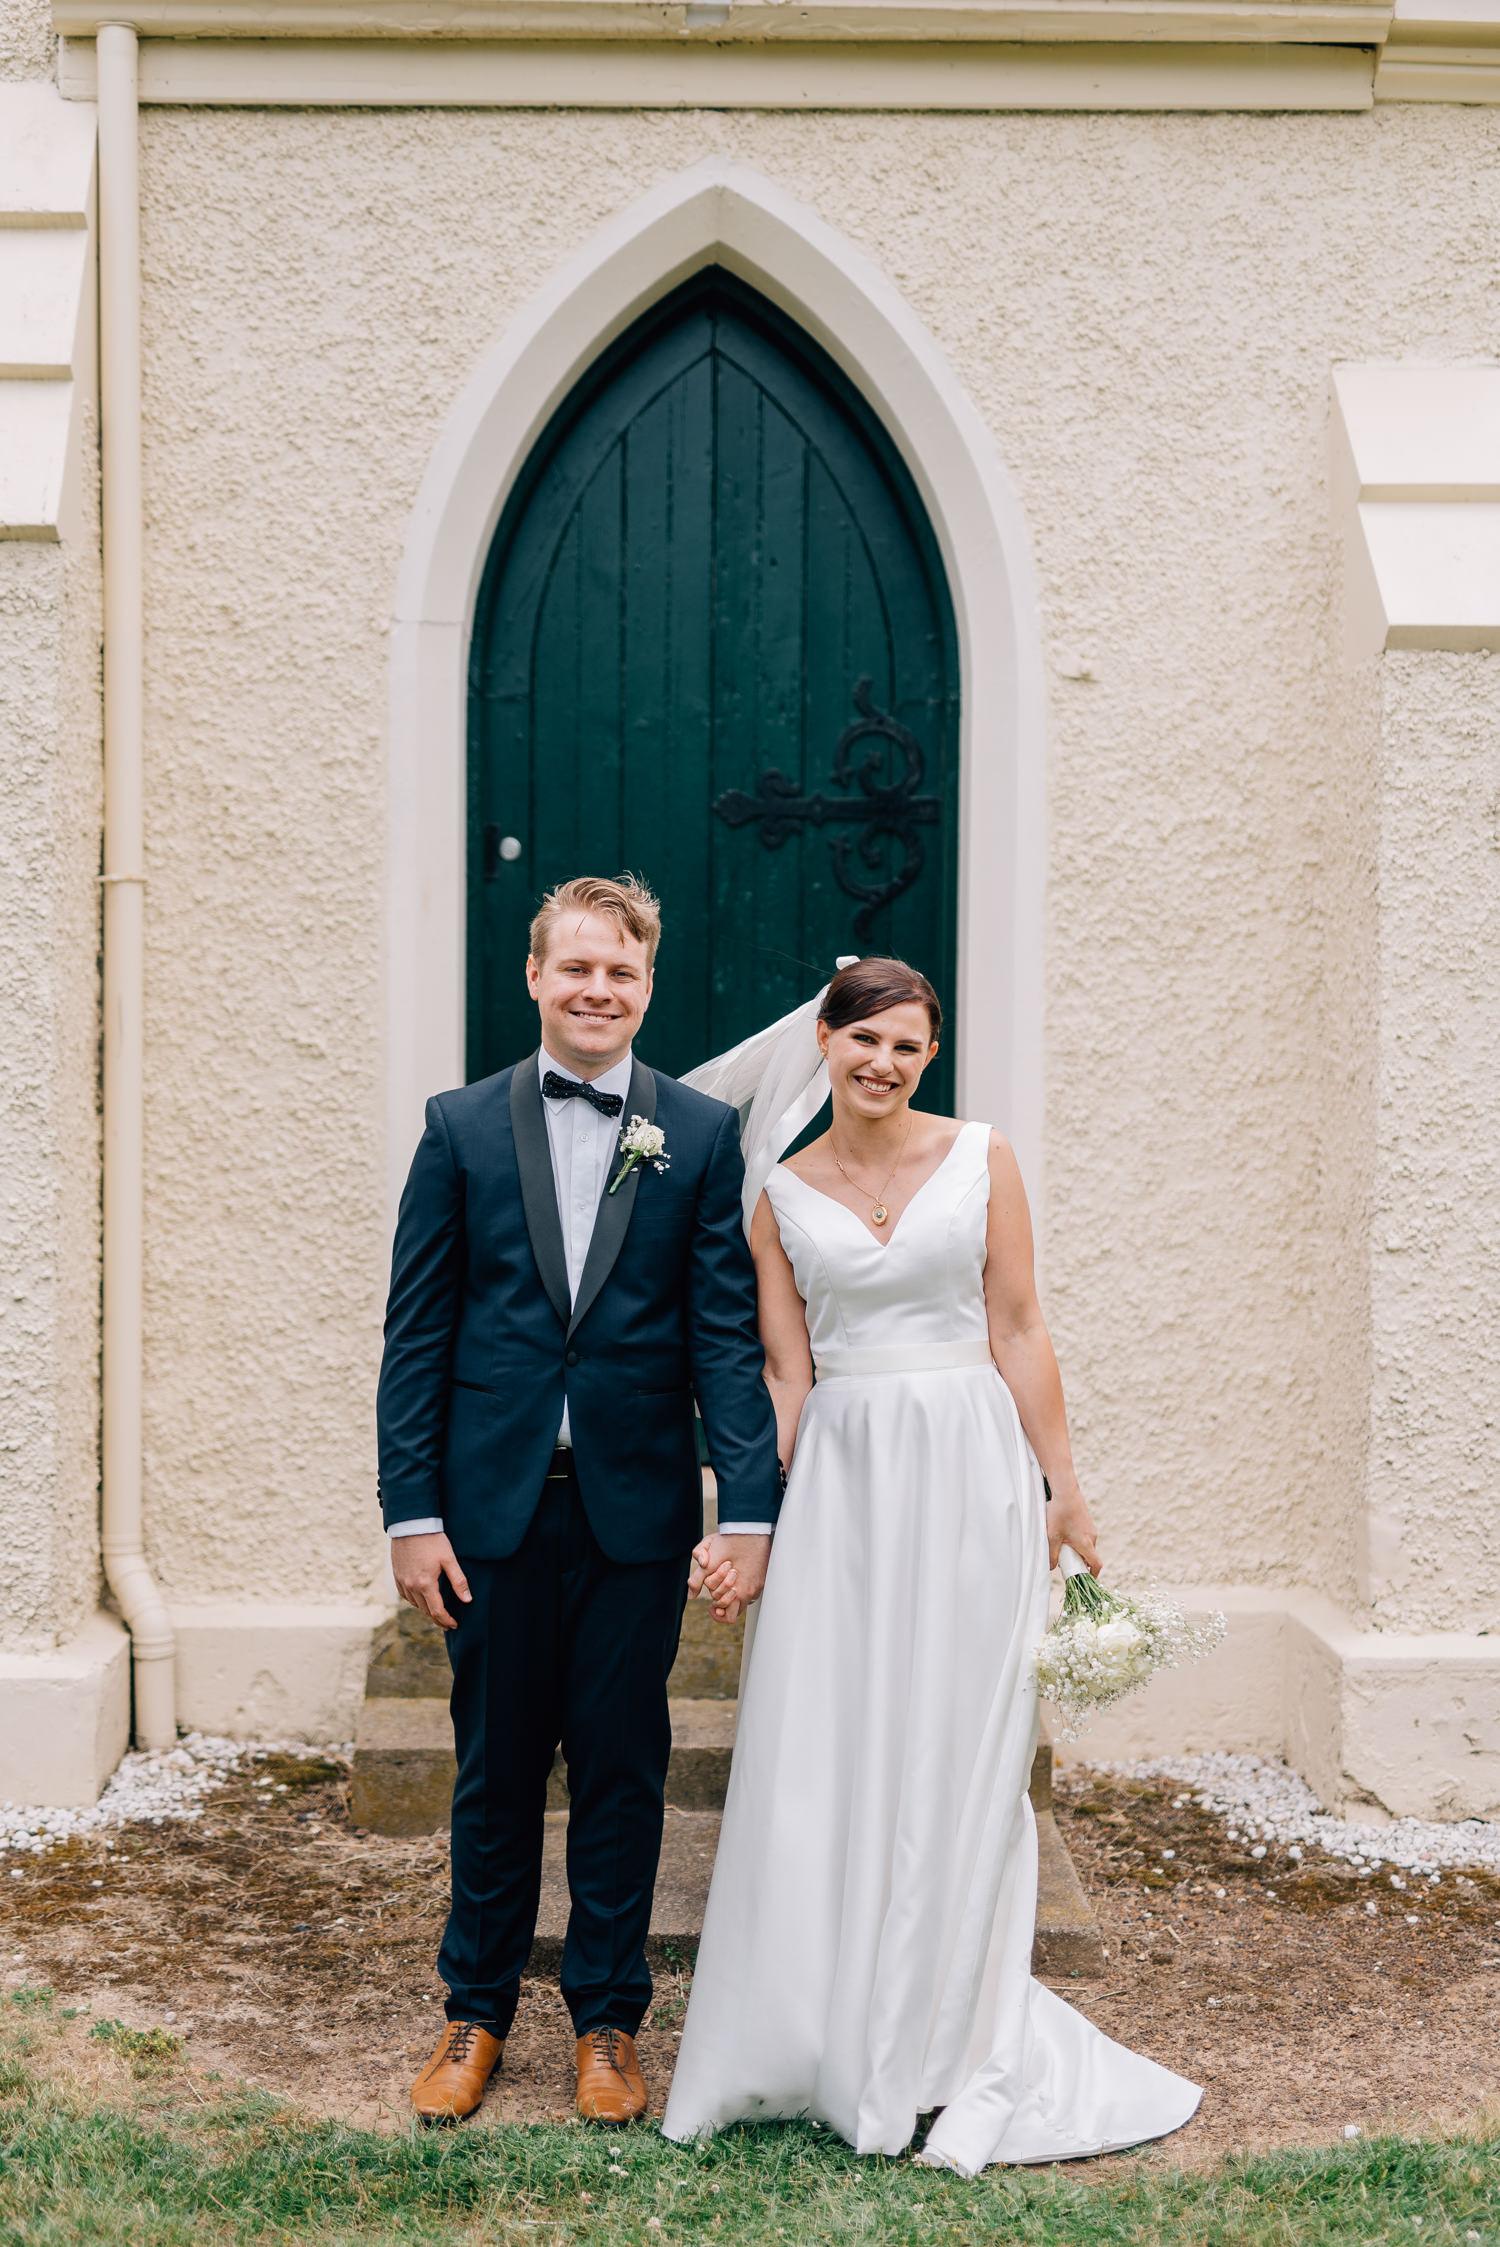 Josef-Chromy-Wedding-Photographer-45.jpg